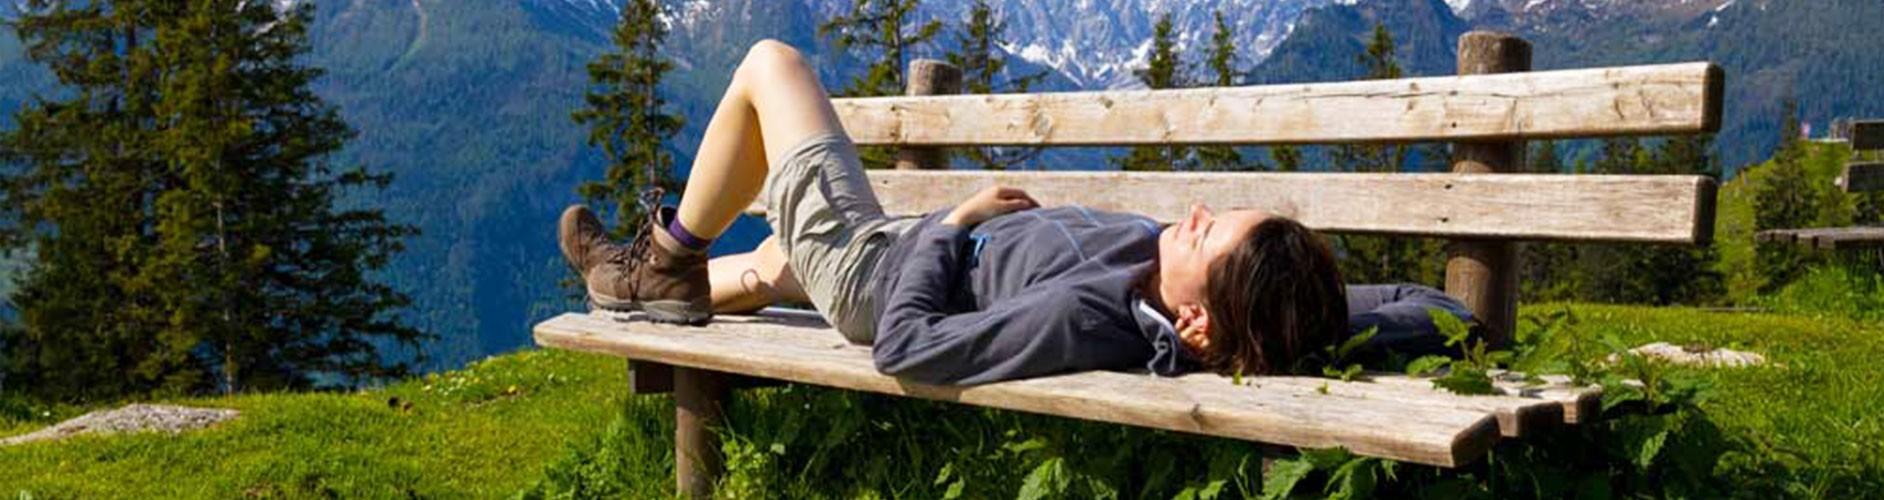 Genusswandern in Berchtesgaden